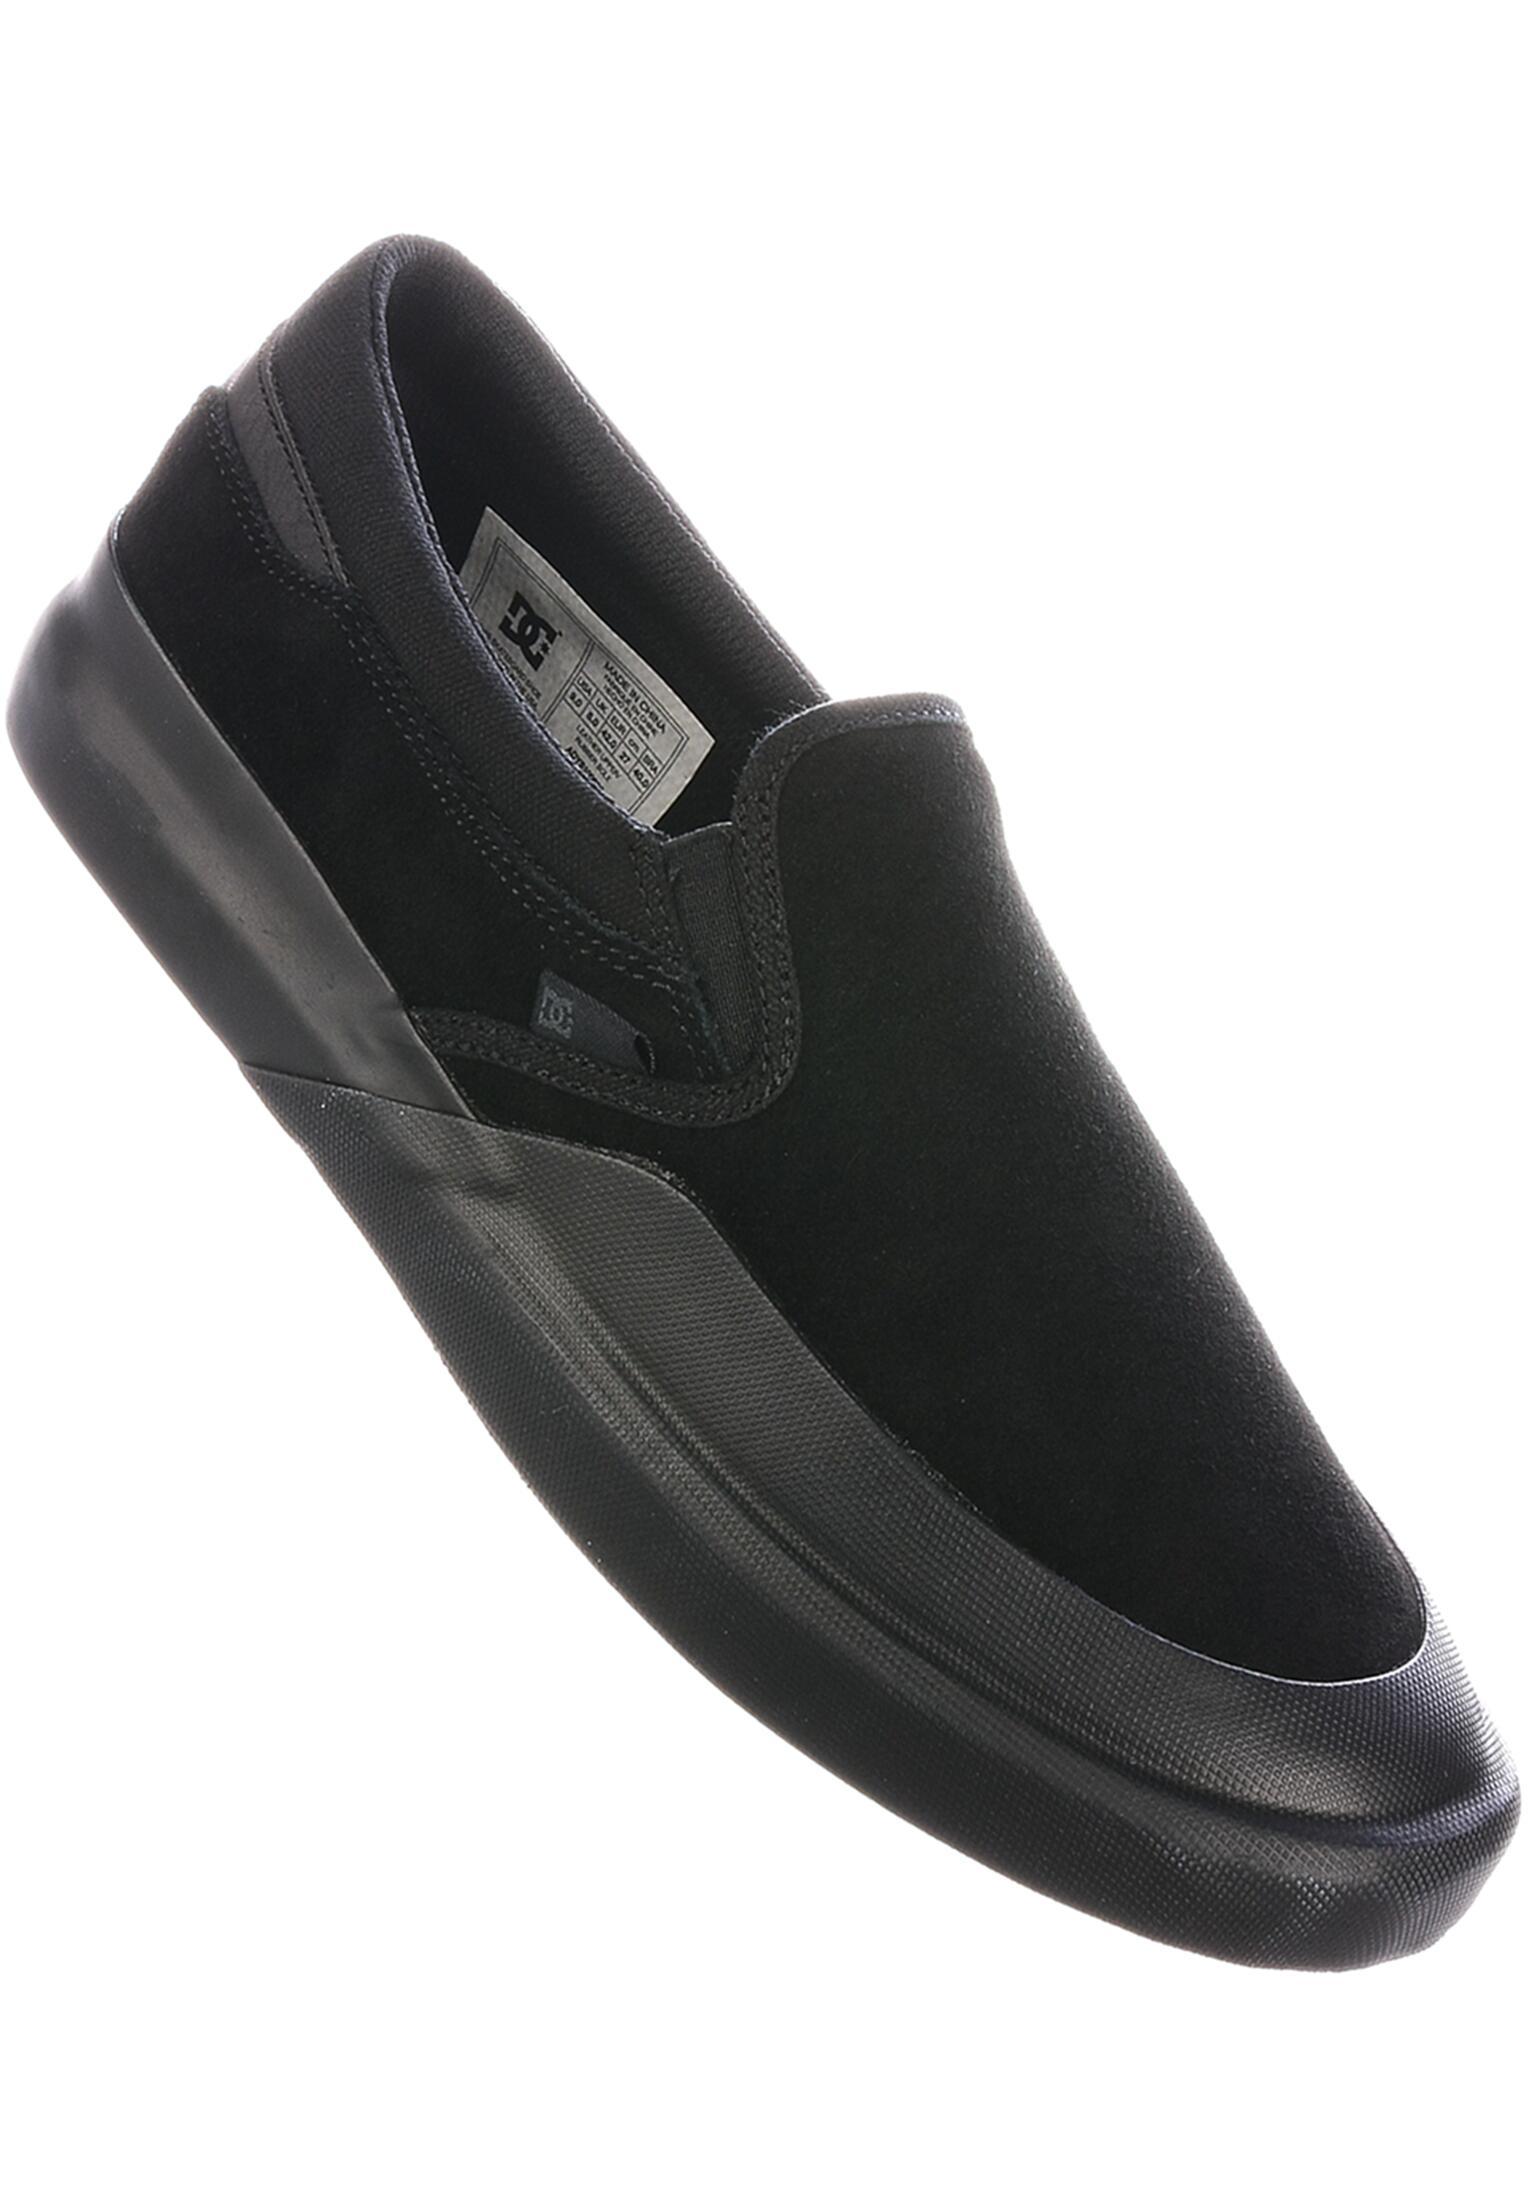 Infinite Slip Jaakko DC Shoes All Shoes